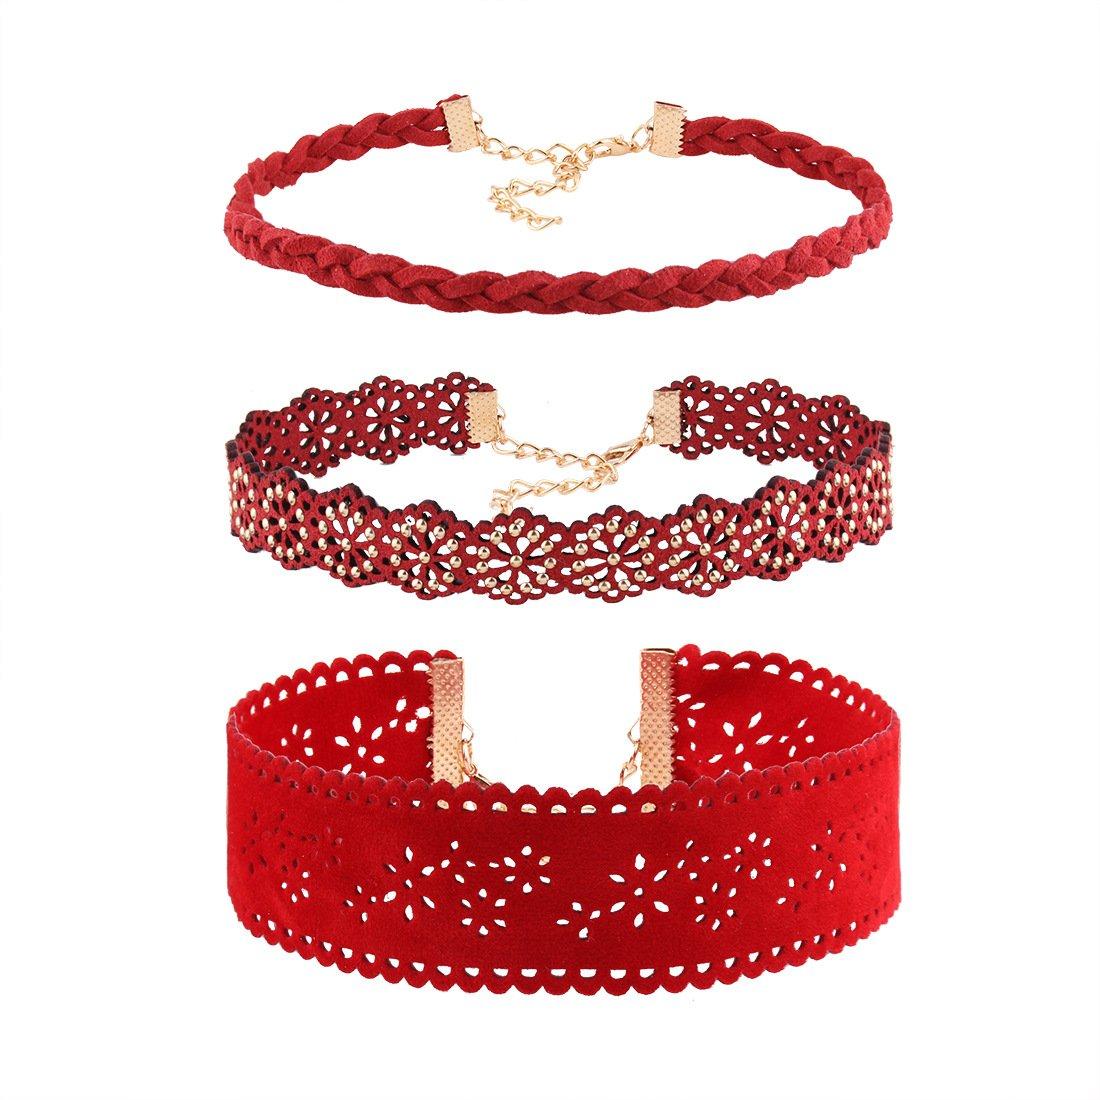 Bystar Choker 3PCS Fashion Red Choker Necklace Rhinestone Hollow Set for Womens N201740101